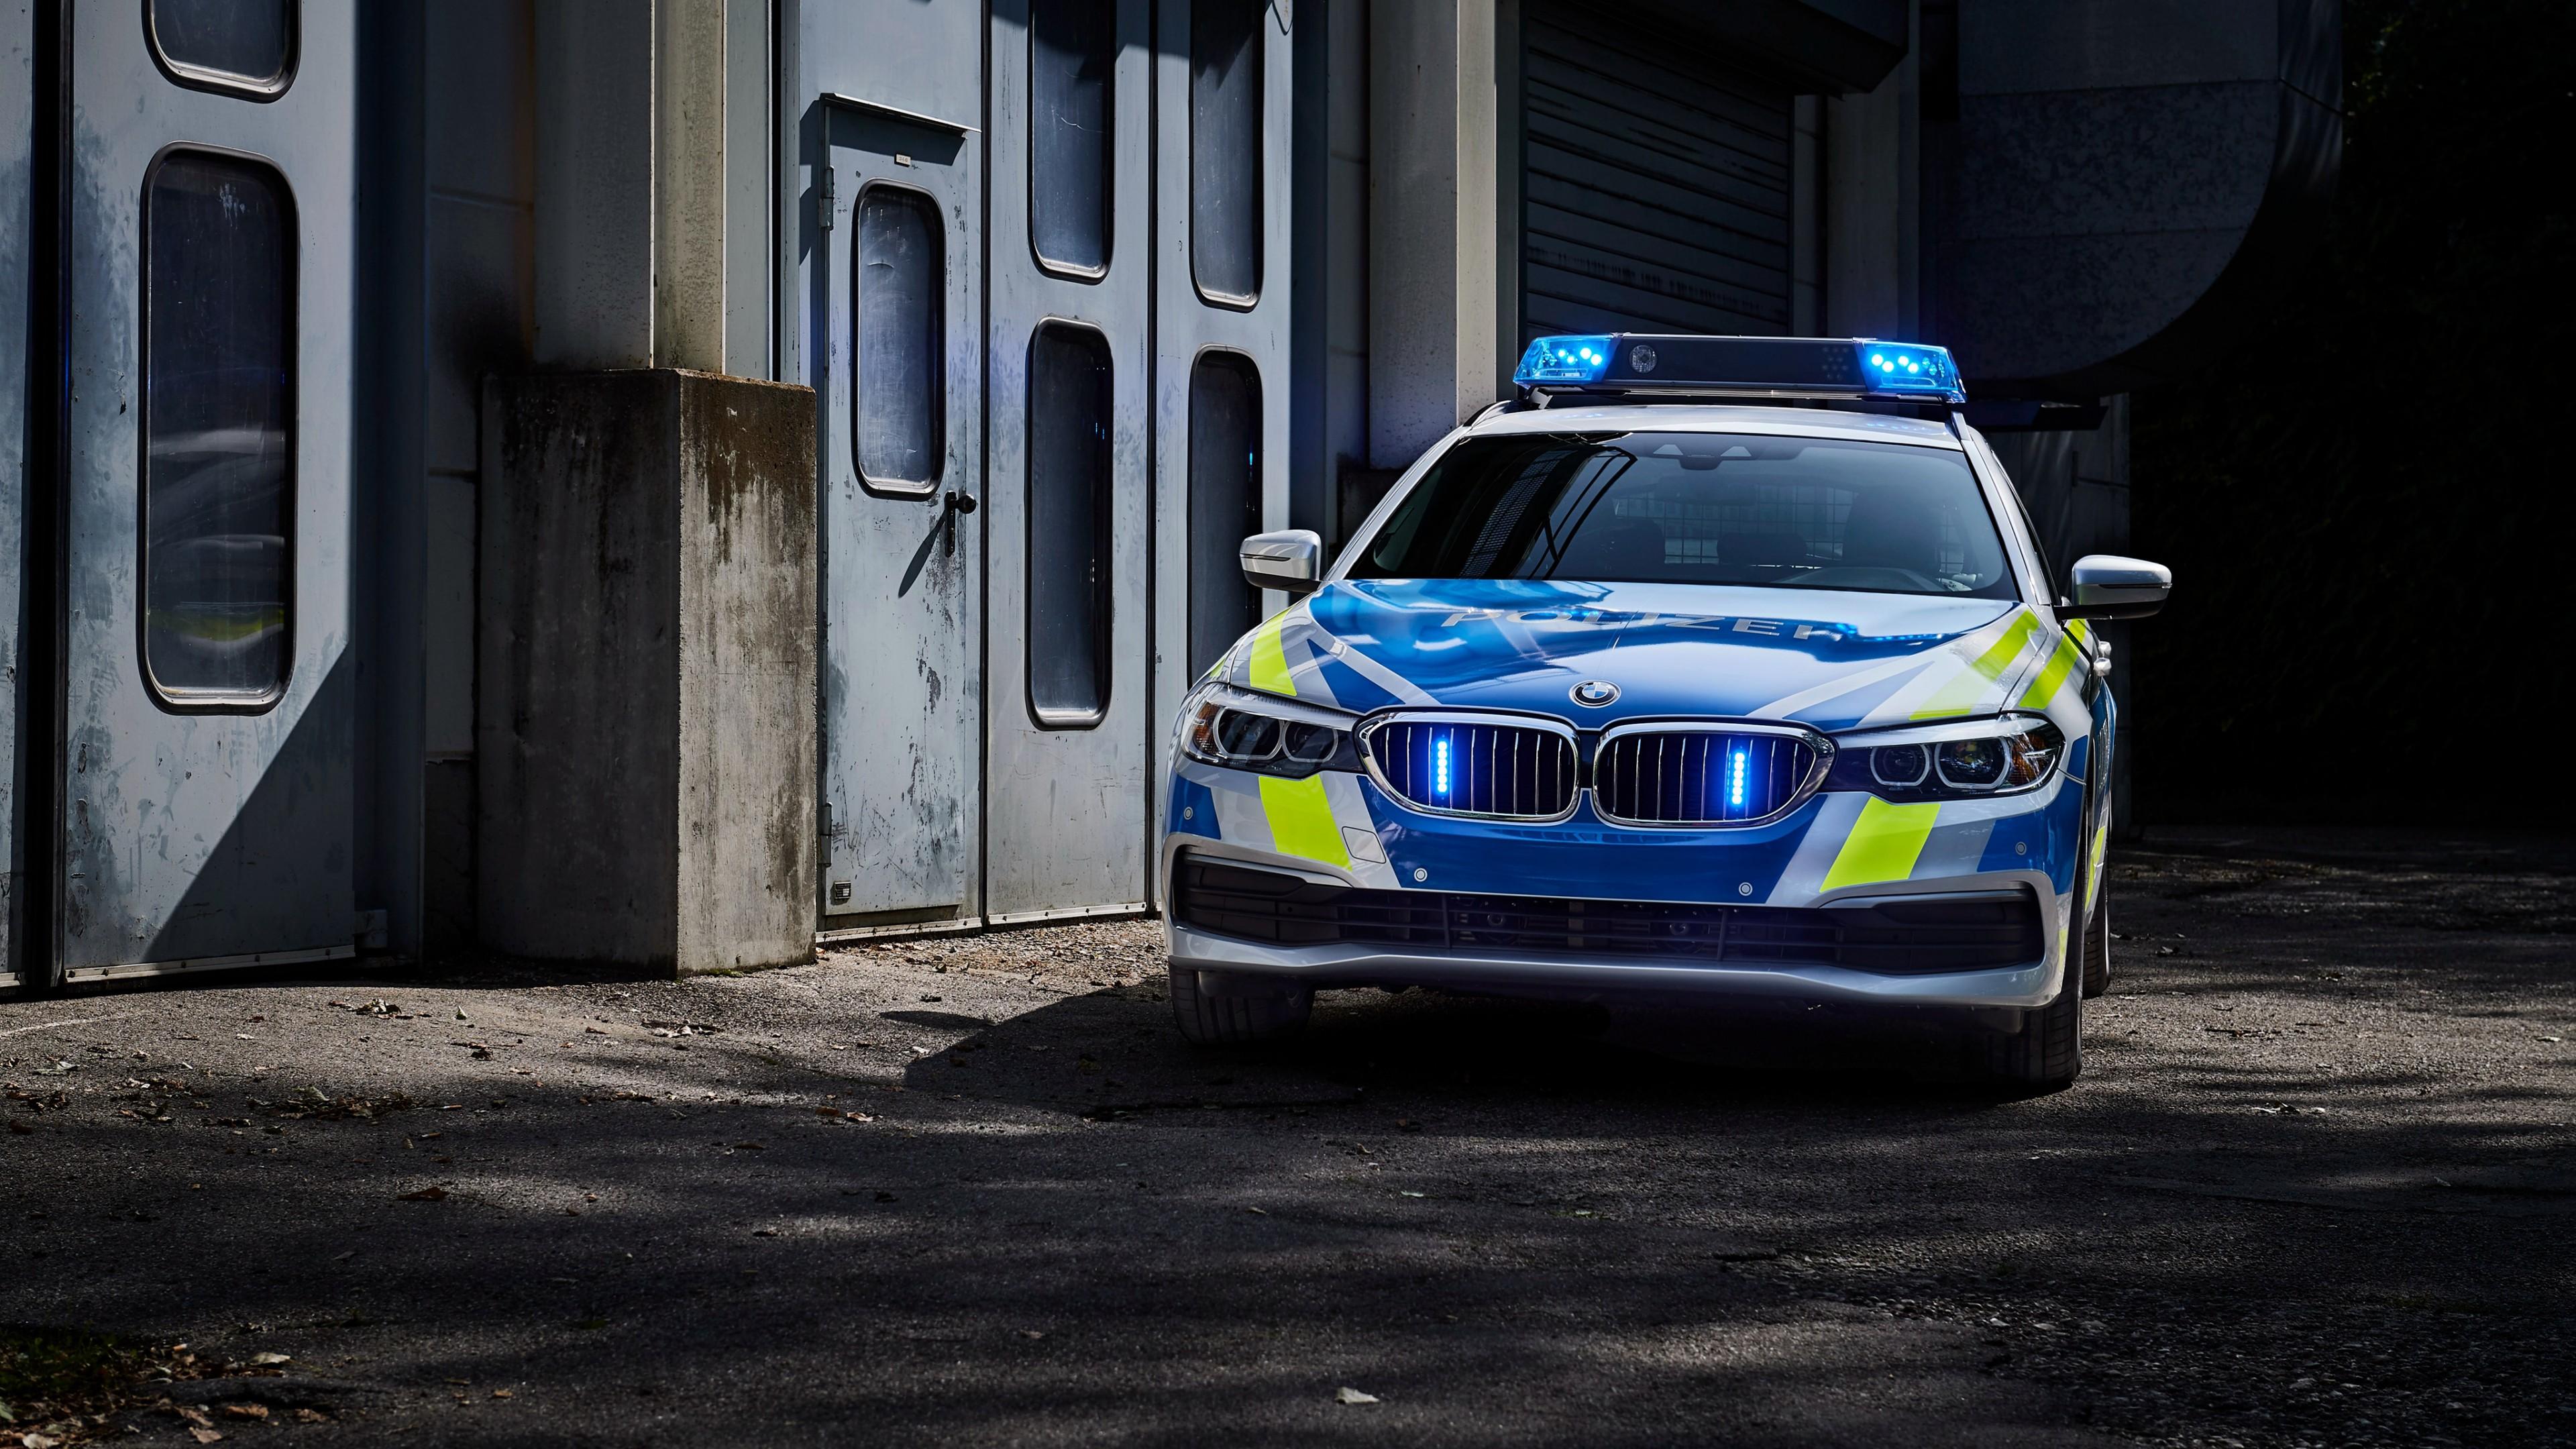 Bmw 530d Xdrive Touring Polizei 2017 4k Wallpaper Hd Car Wallpapers Id 8379